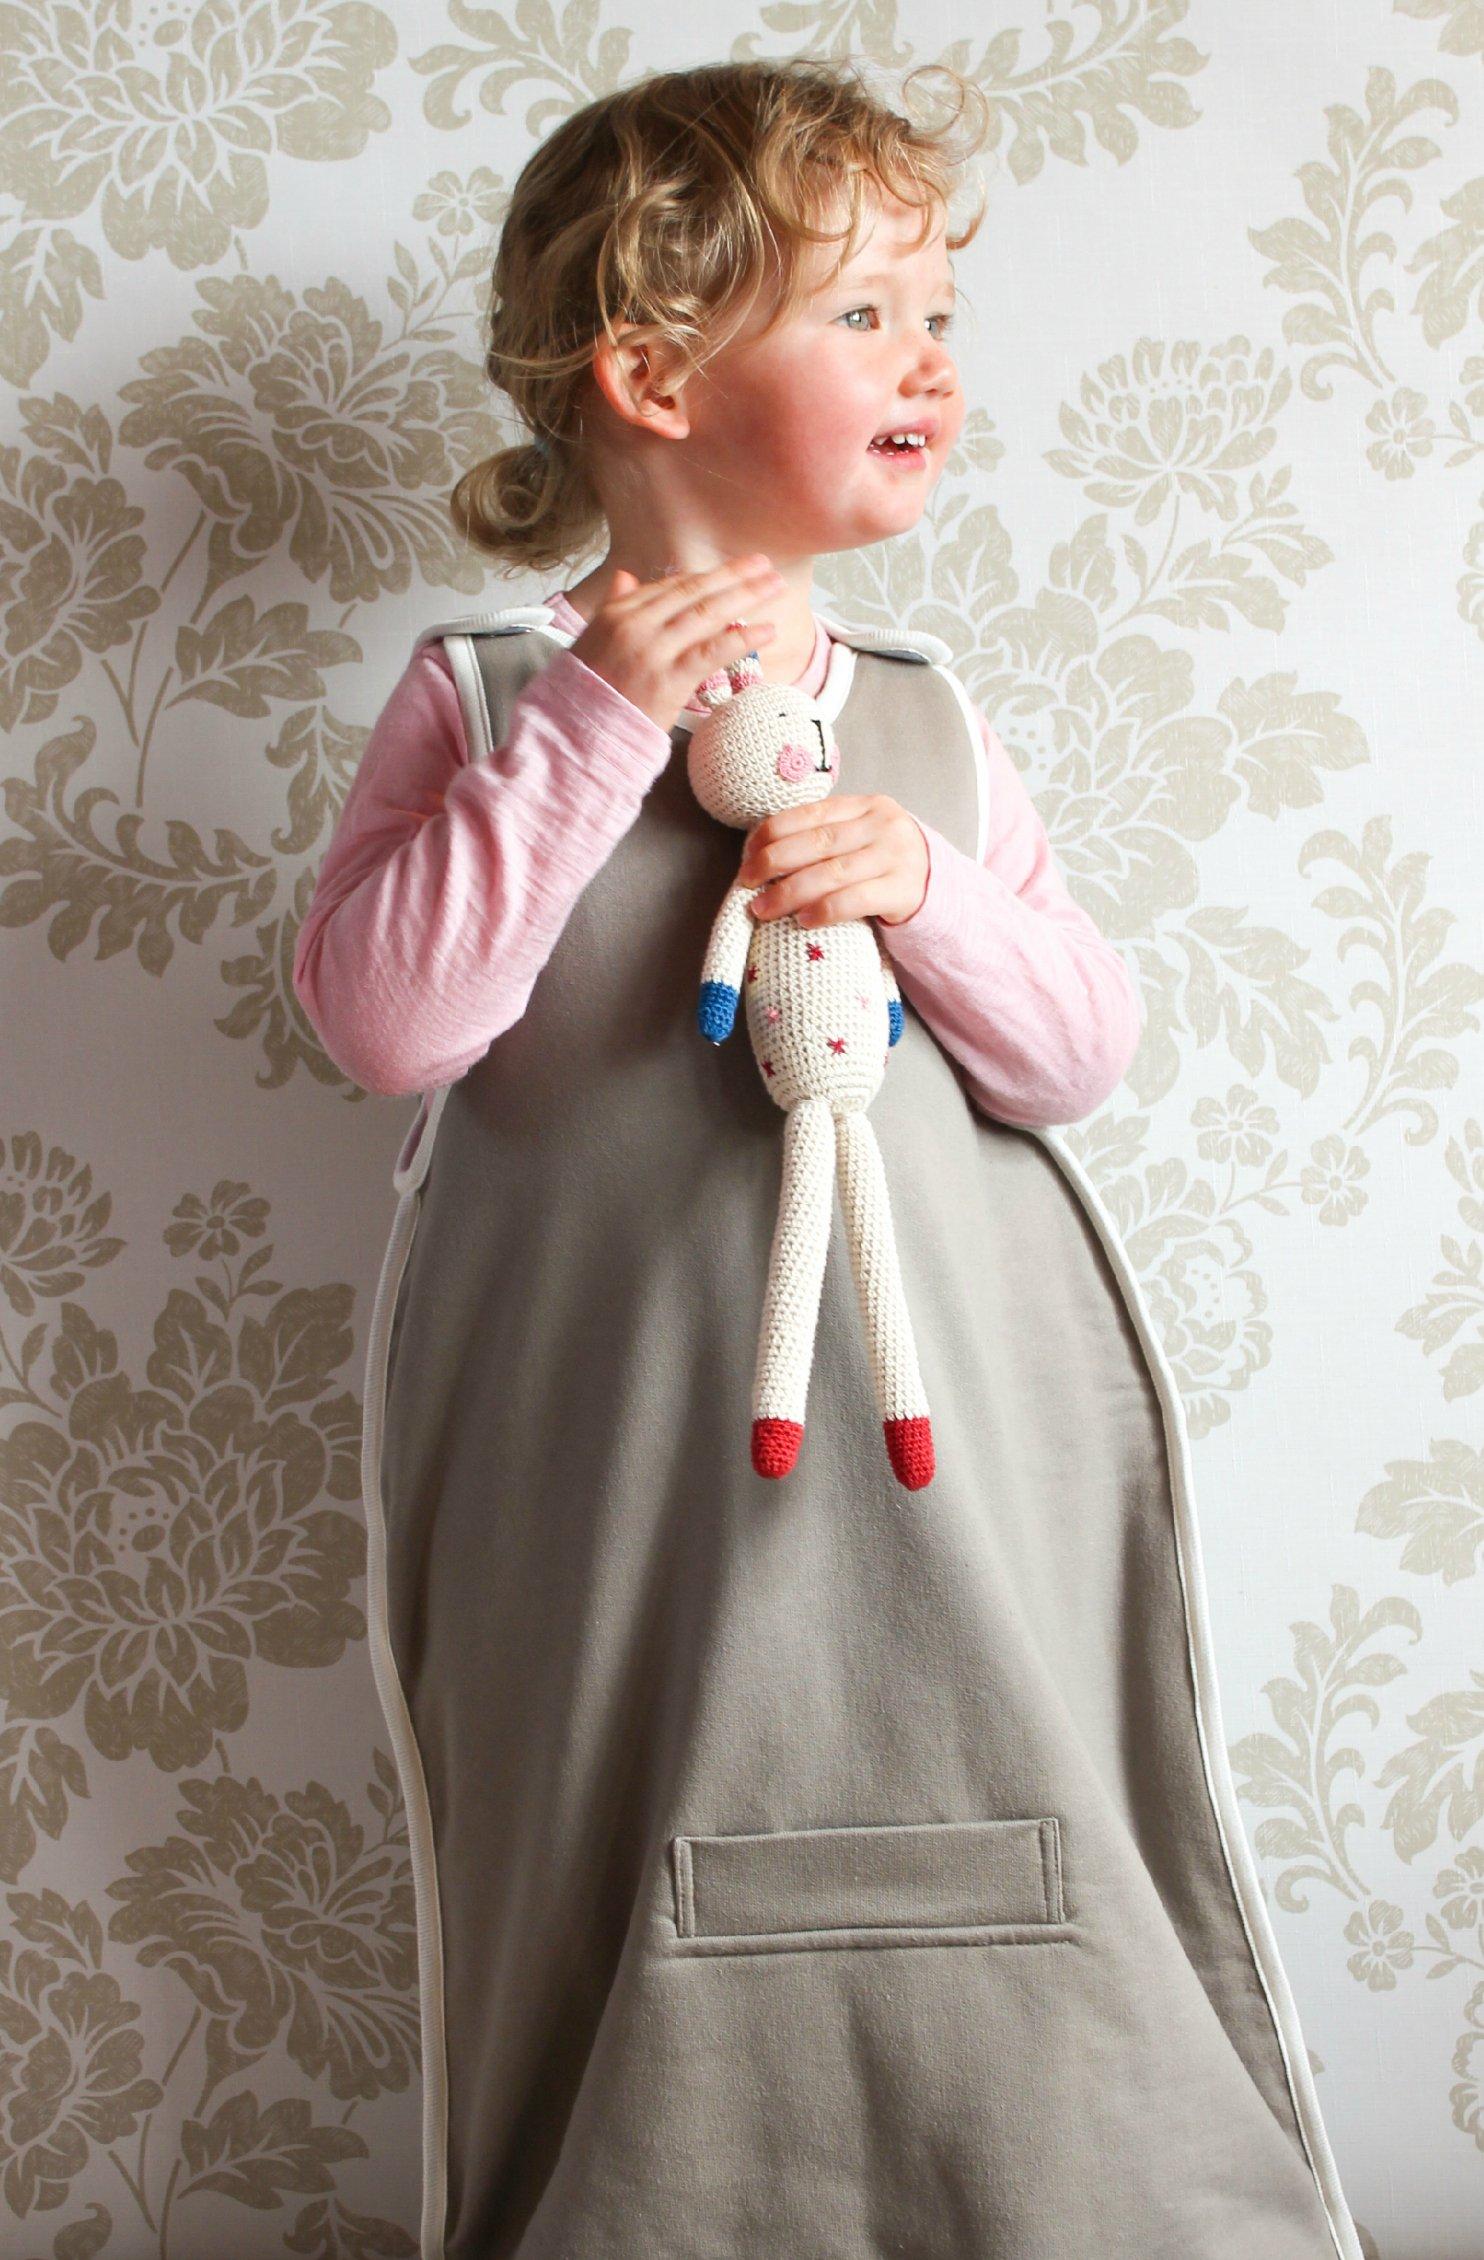 STANDARD MERINO Baby Sleep Sack / 3 SEASON MERINO Sleep Bag, 0-2 yrs, Oatmeal